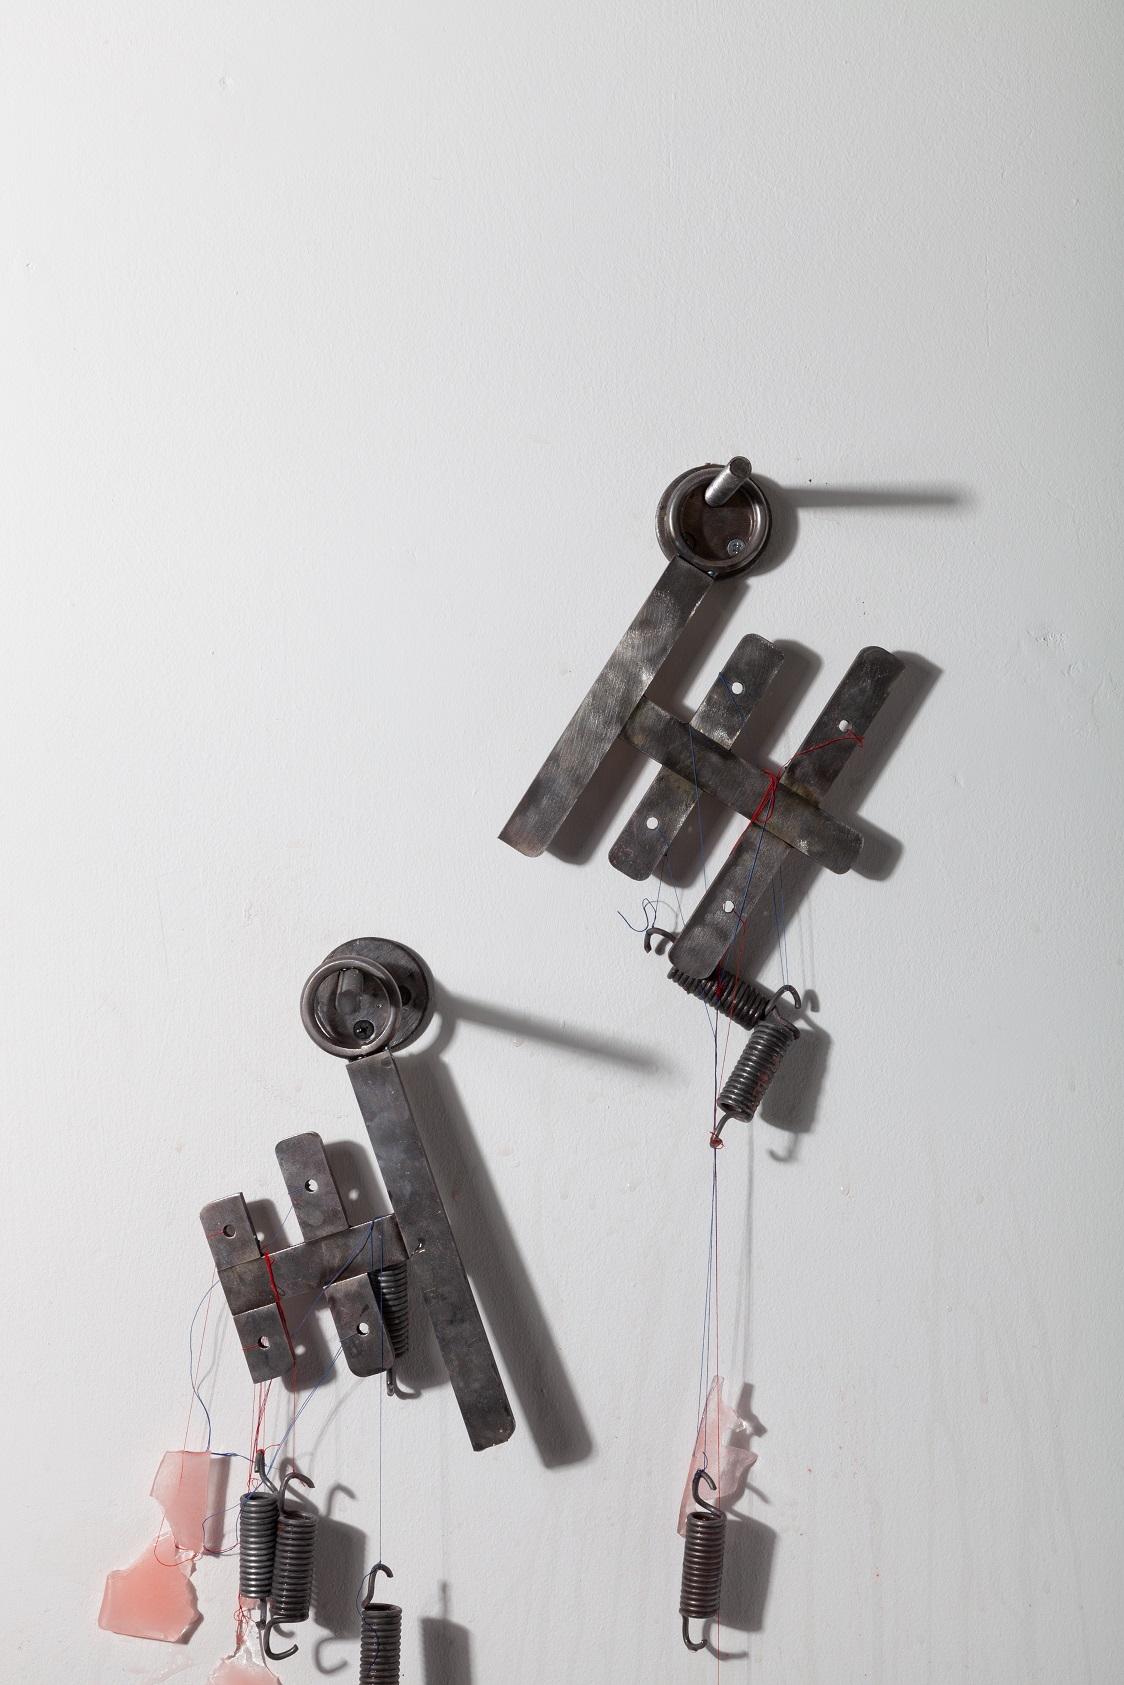 Rafal Zajko, Unison, 2018. Ice, pigment, steel, cotton thread, tension springs. 34 x 24 x 10 cm.